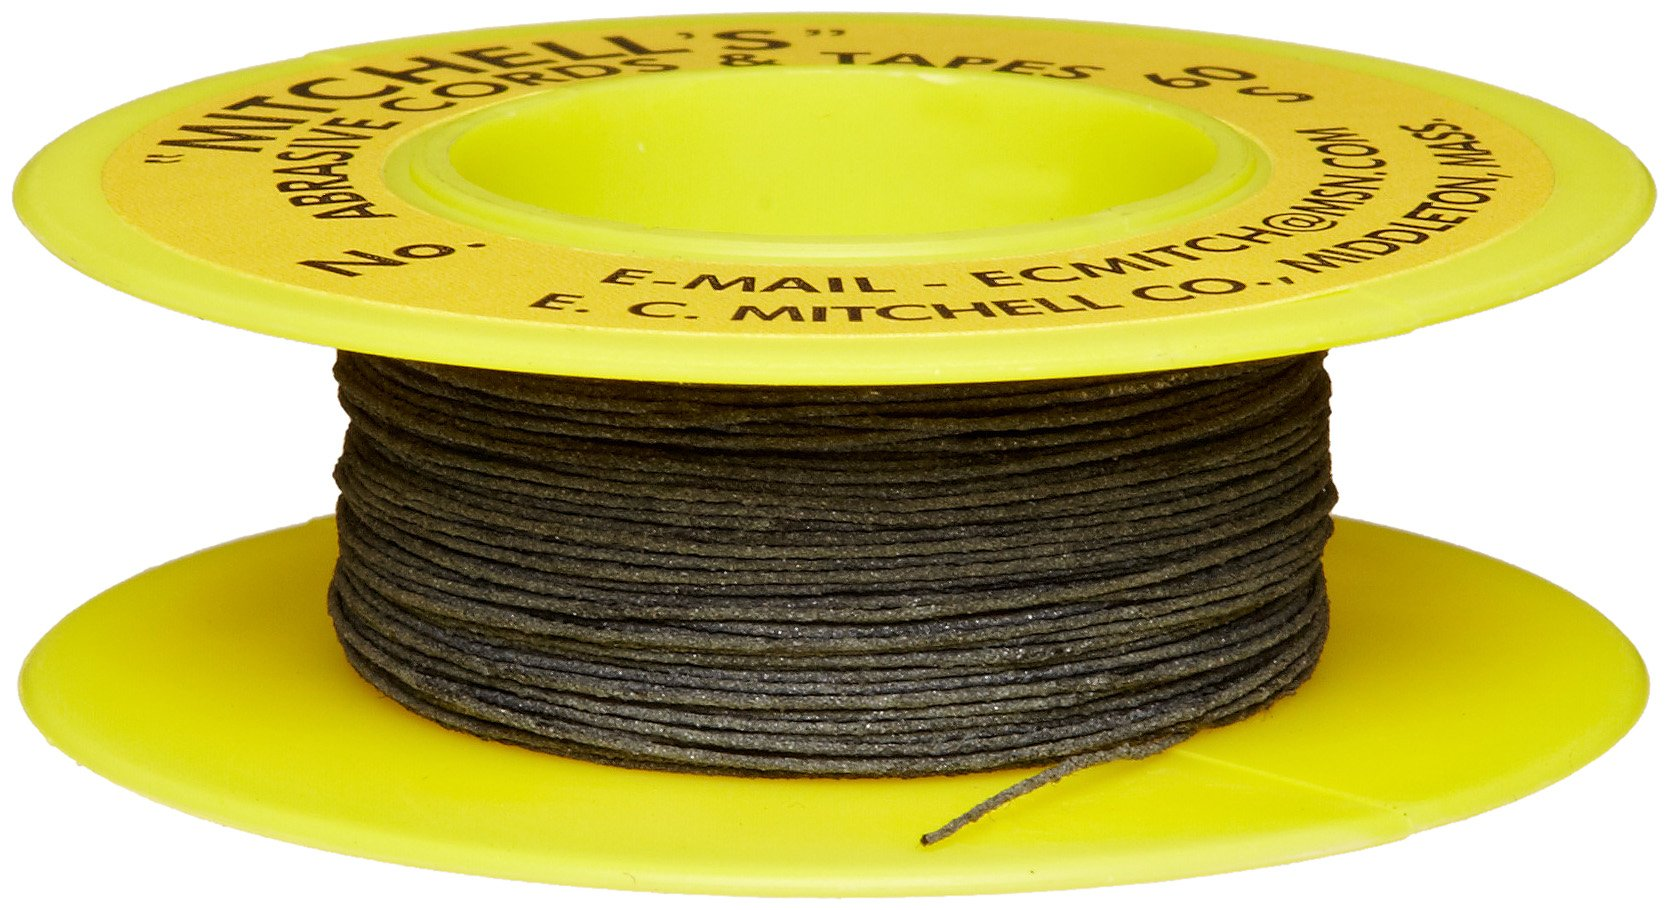 Mitchell Abrasives 60-S Round Abrasive Cord, Silicon Carbide 200 Grit .015'' Diameter x 50 Feet by Mitchell Abrasives